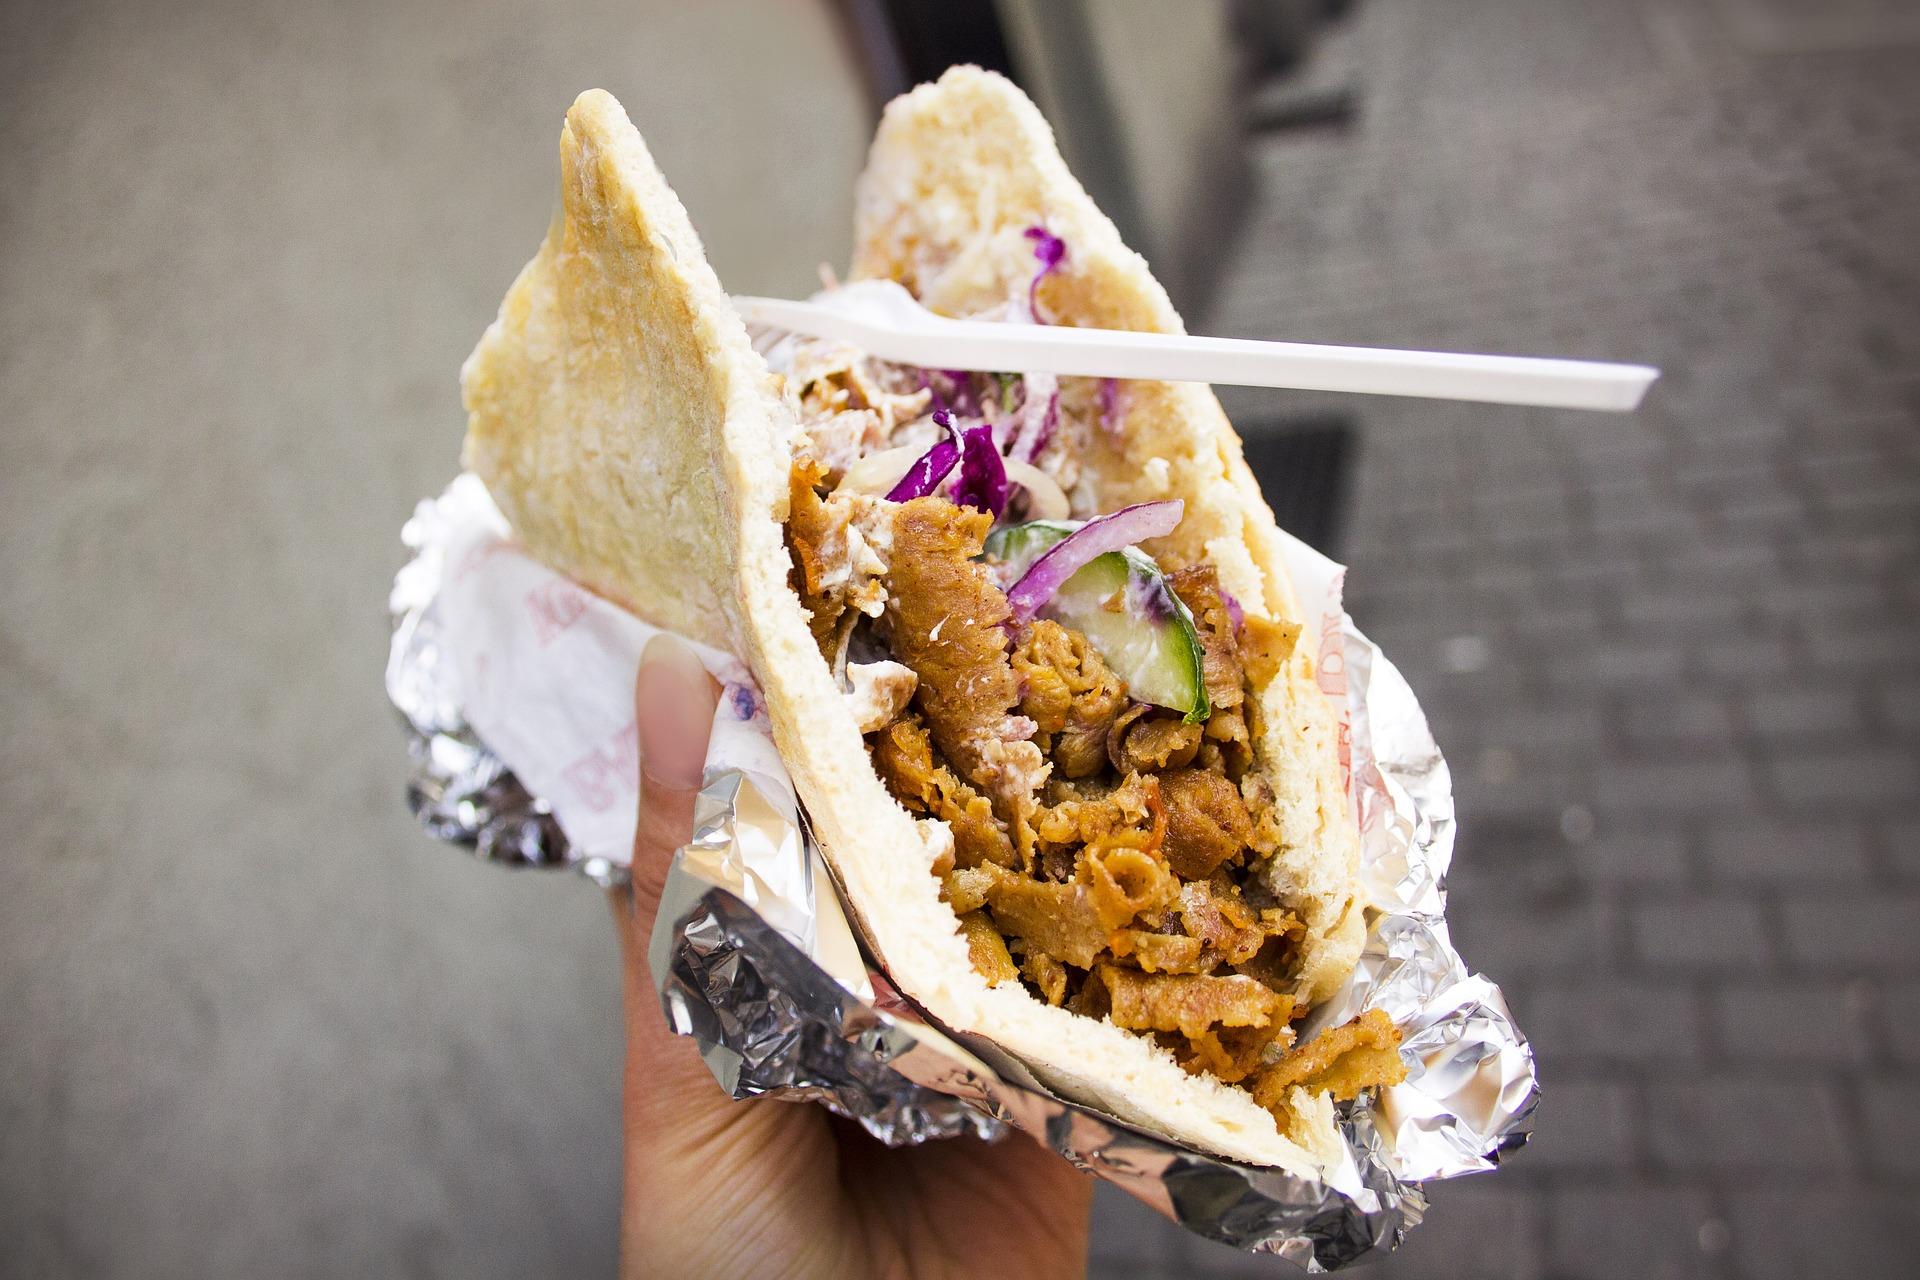 Doner Kebab, döner kebab, shawarma